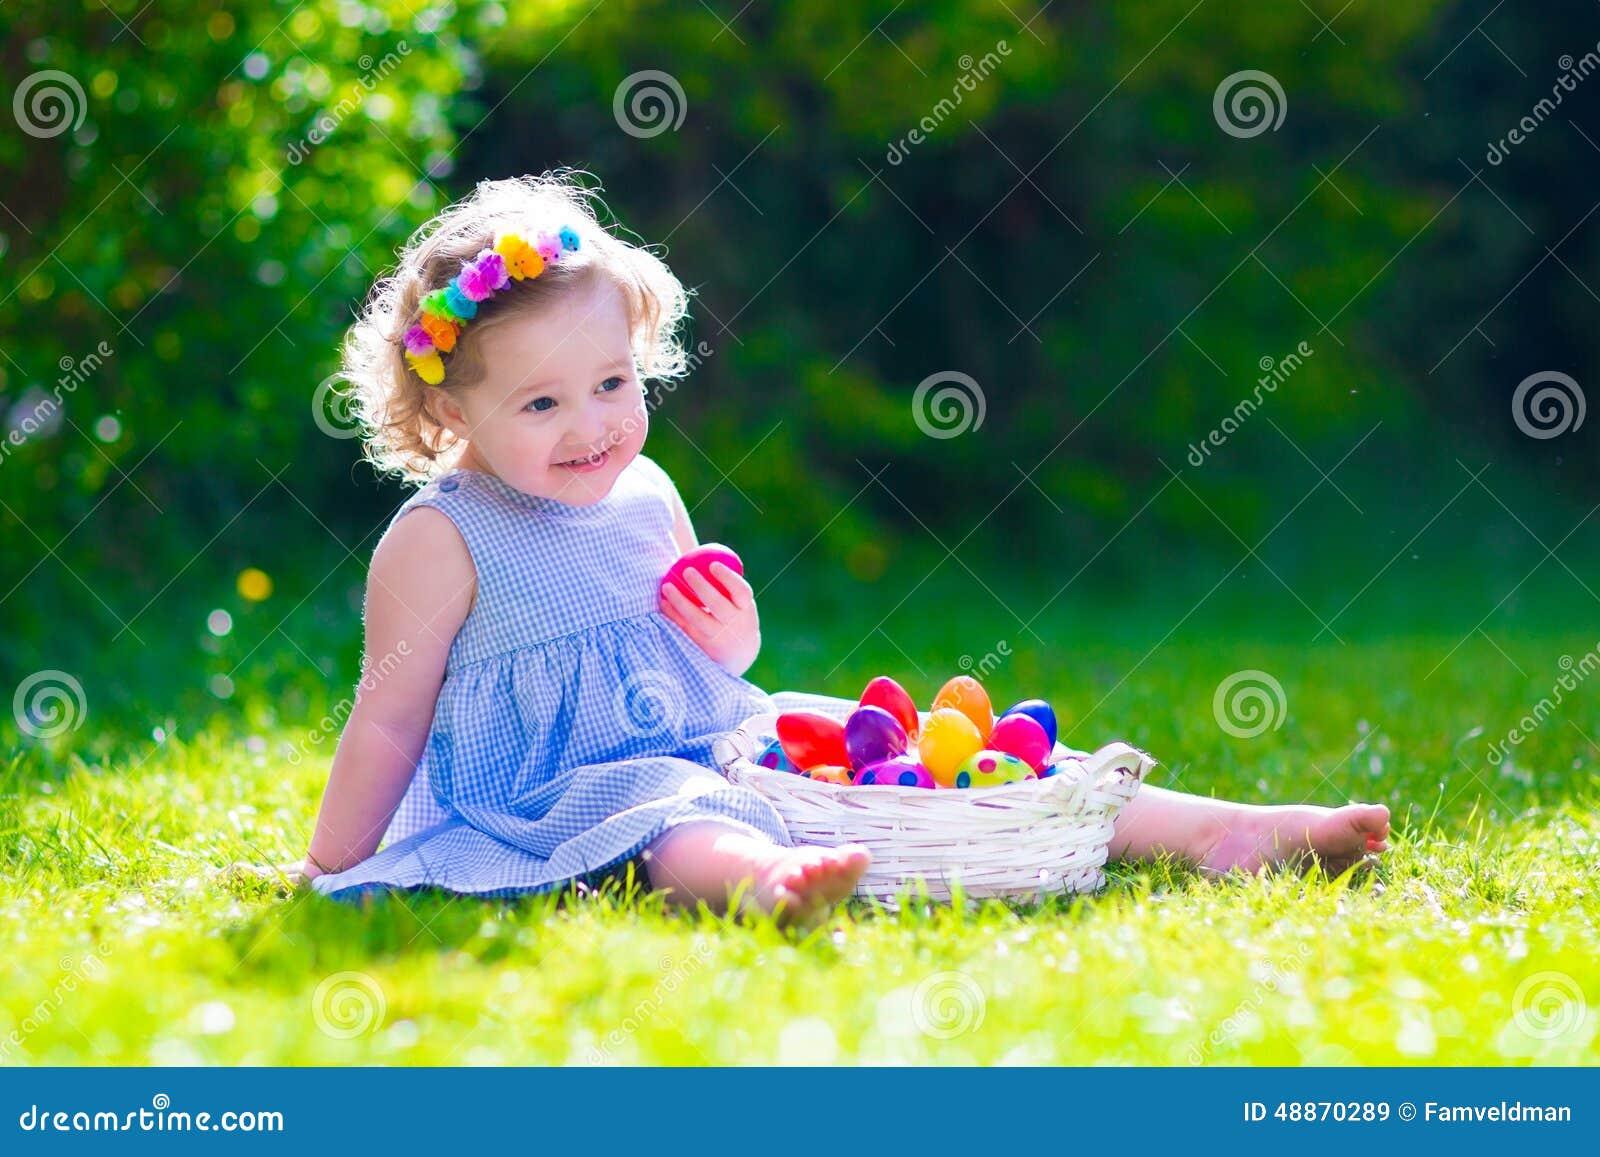 Little Beautiful Girl On Easter Egg Hunt Stock Photo - Image: 48870289